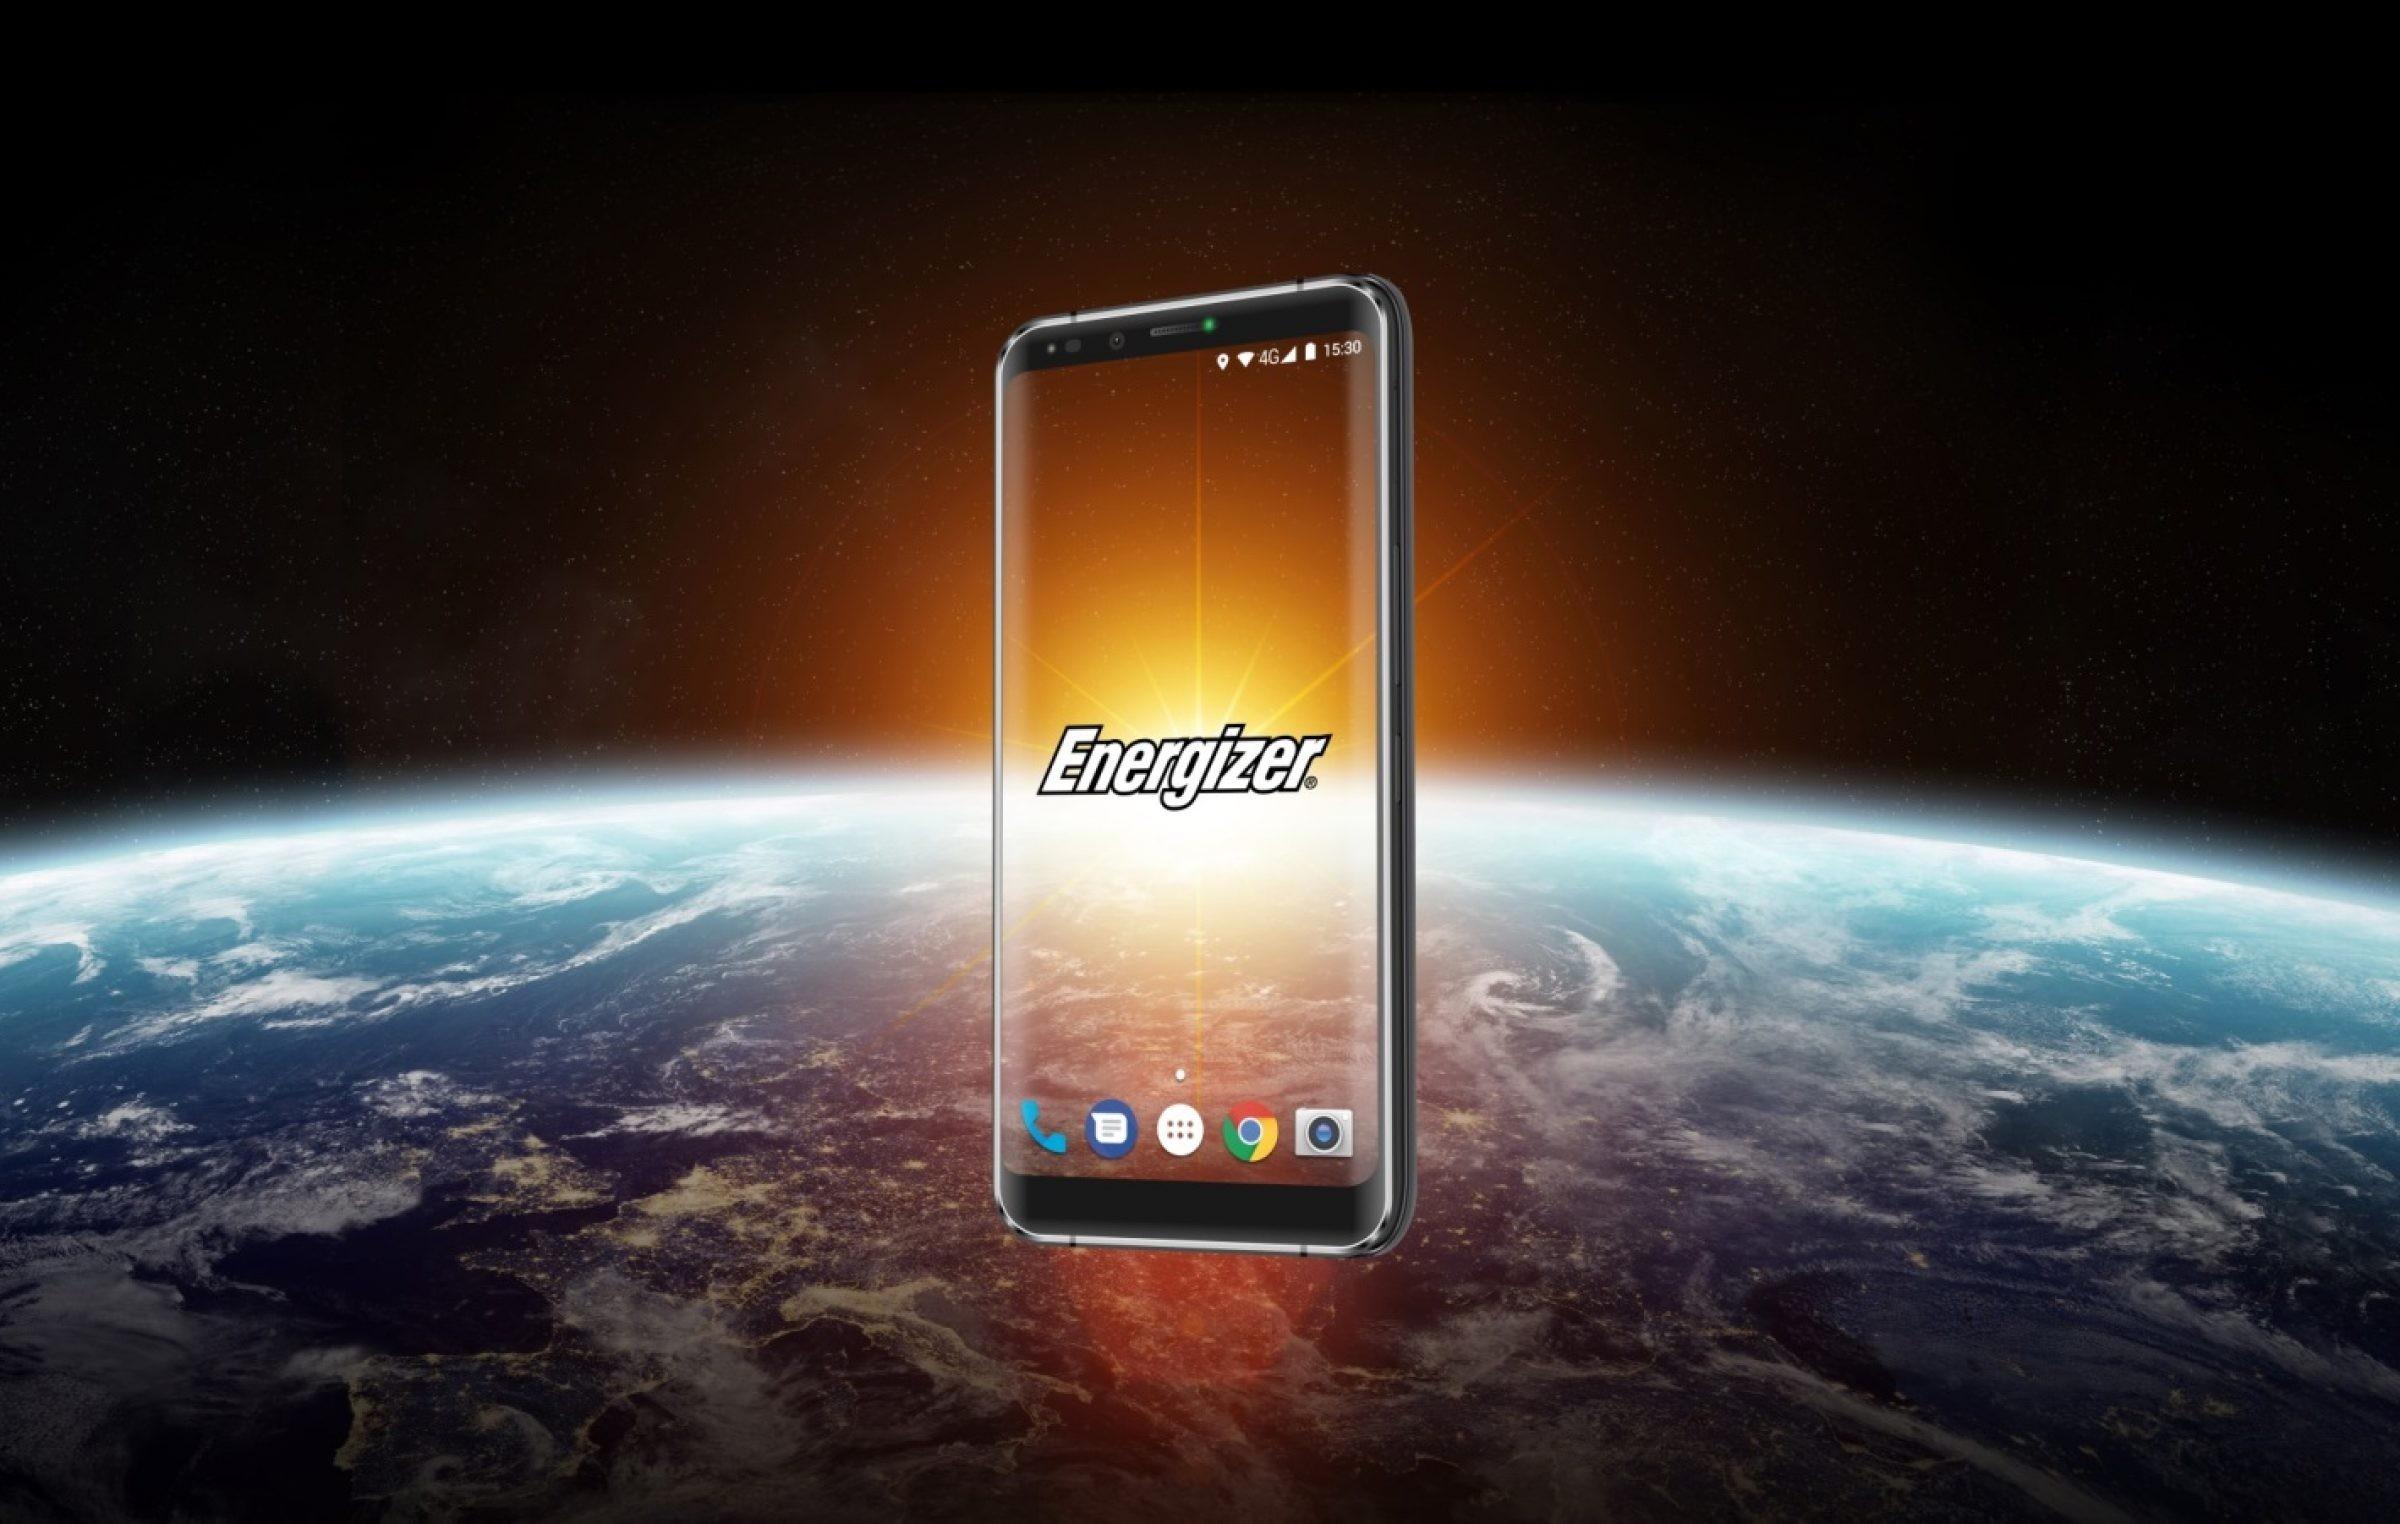 Компания Energizer представила смартфон Power Max 600S